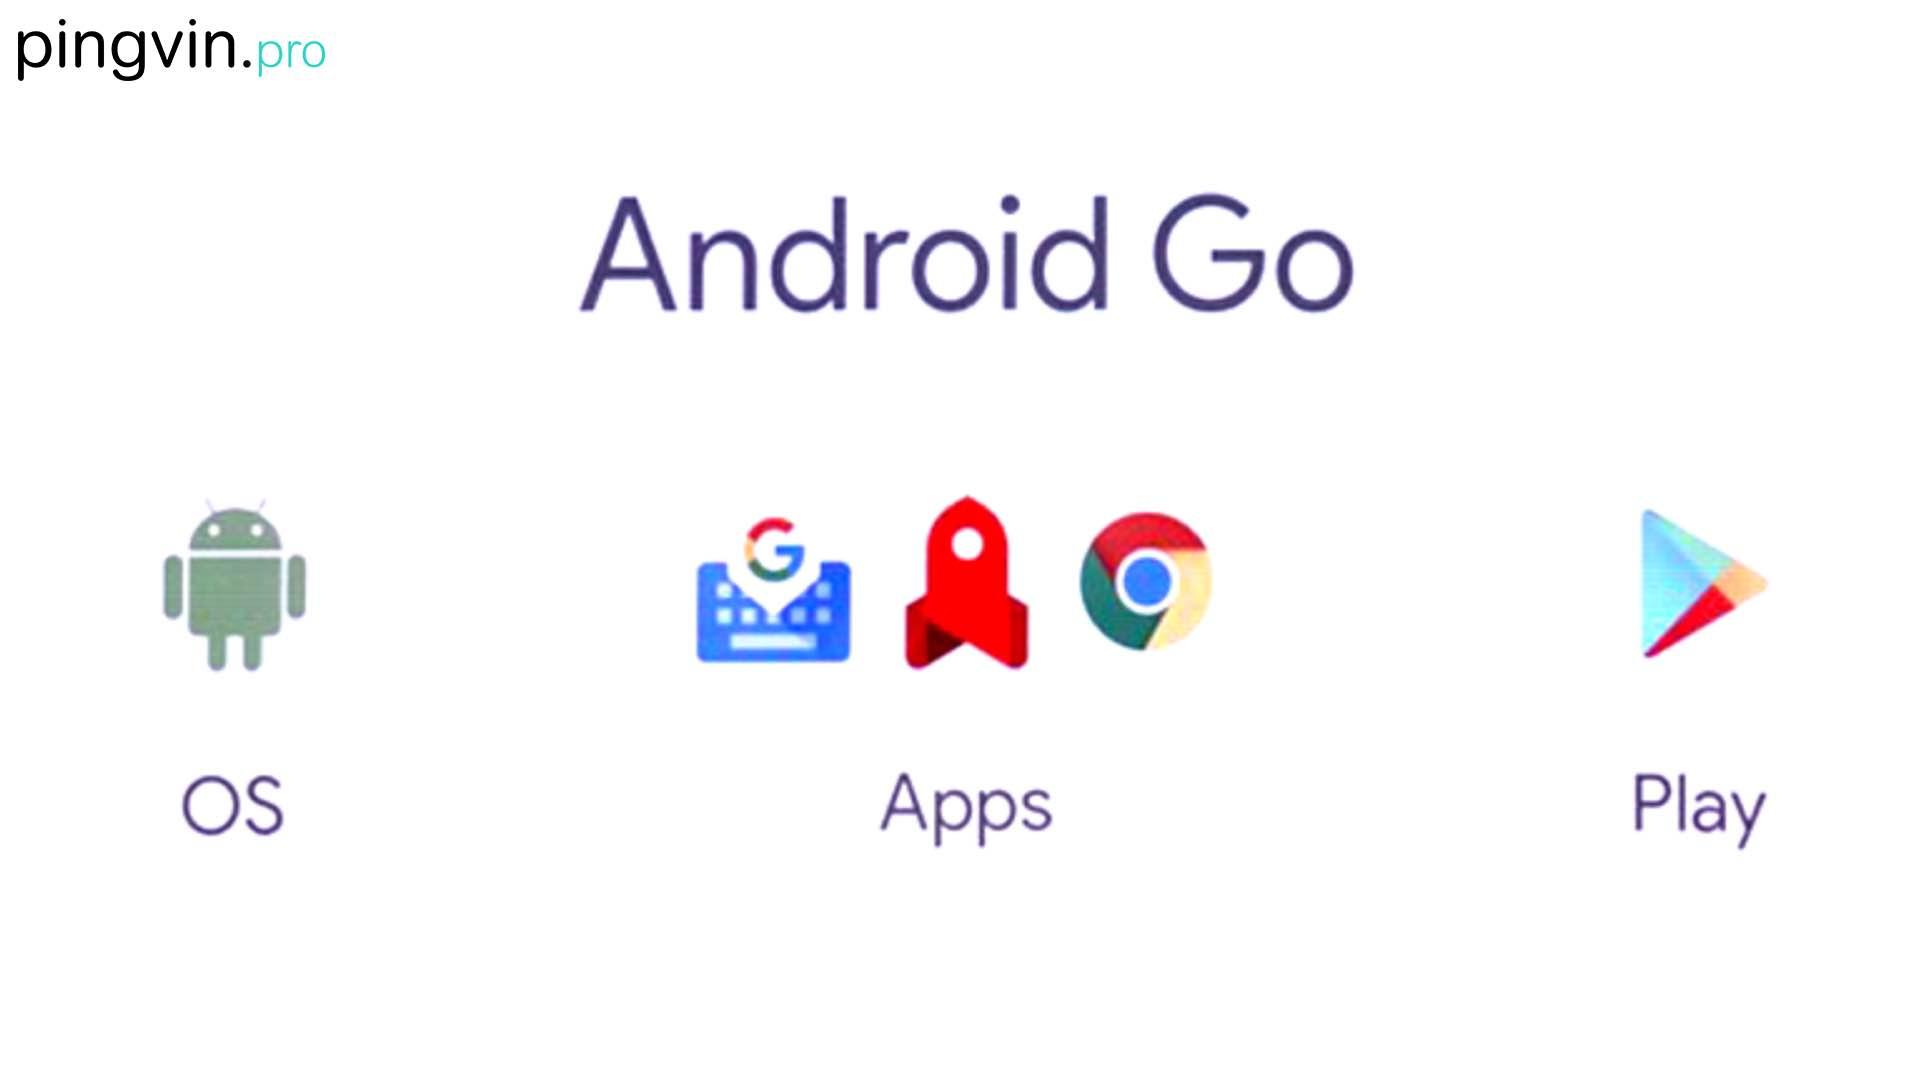 Xiaomi представить ще 3 смартфони: Redmi Go, Redmi Note 7 Pro таMi Mix 3S